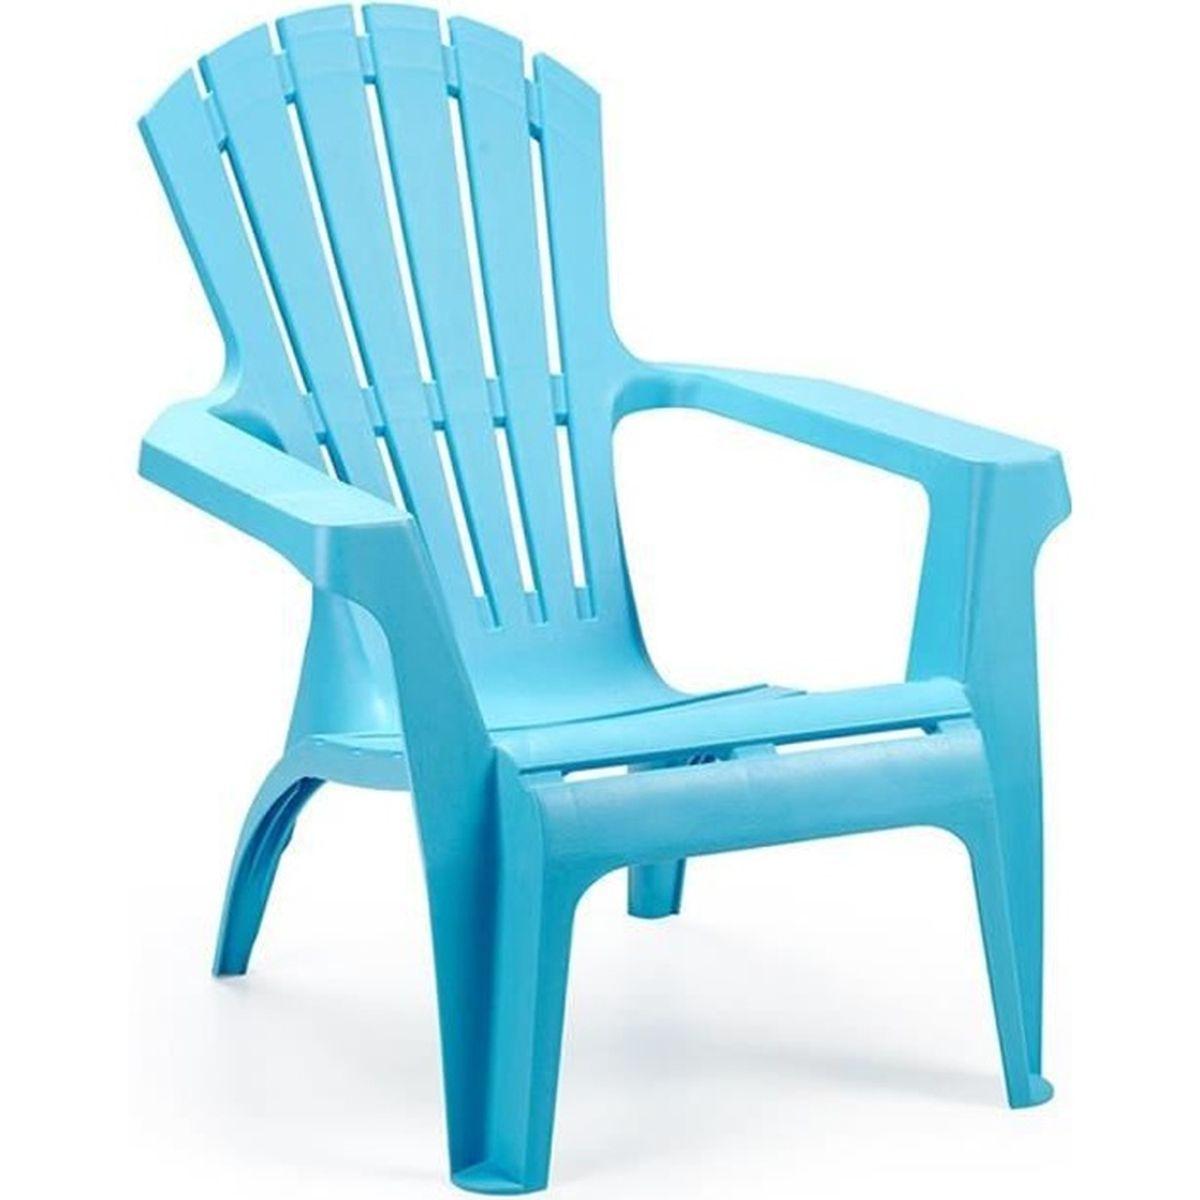 De De Bleu Dolomiti Dolomiti Chaise Chaise Chaise Jardin Jardin Bleu De QorCxdeWEB